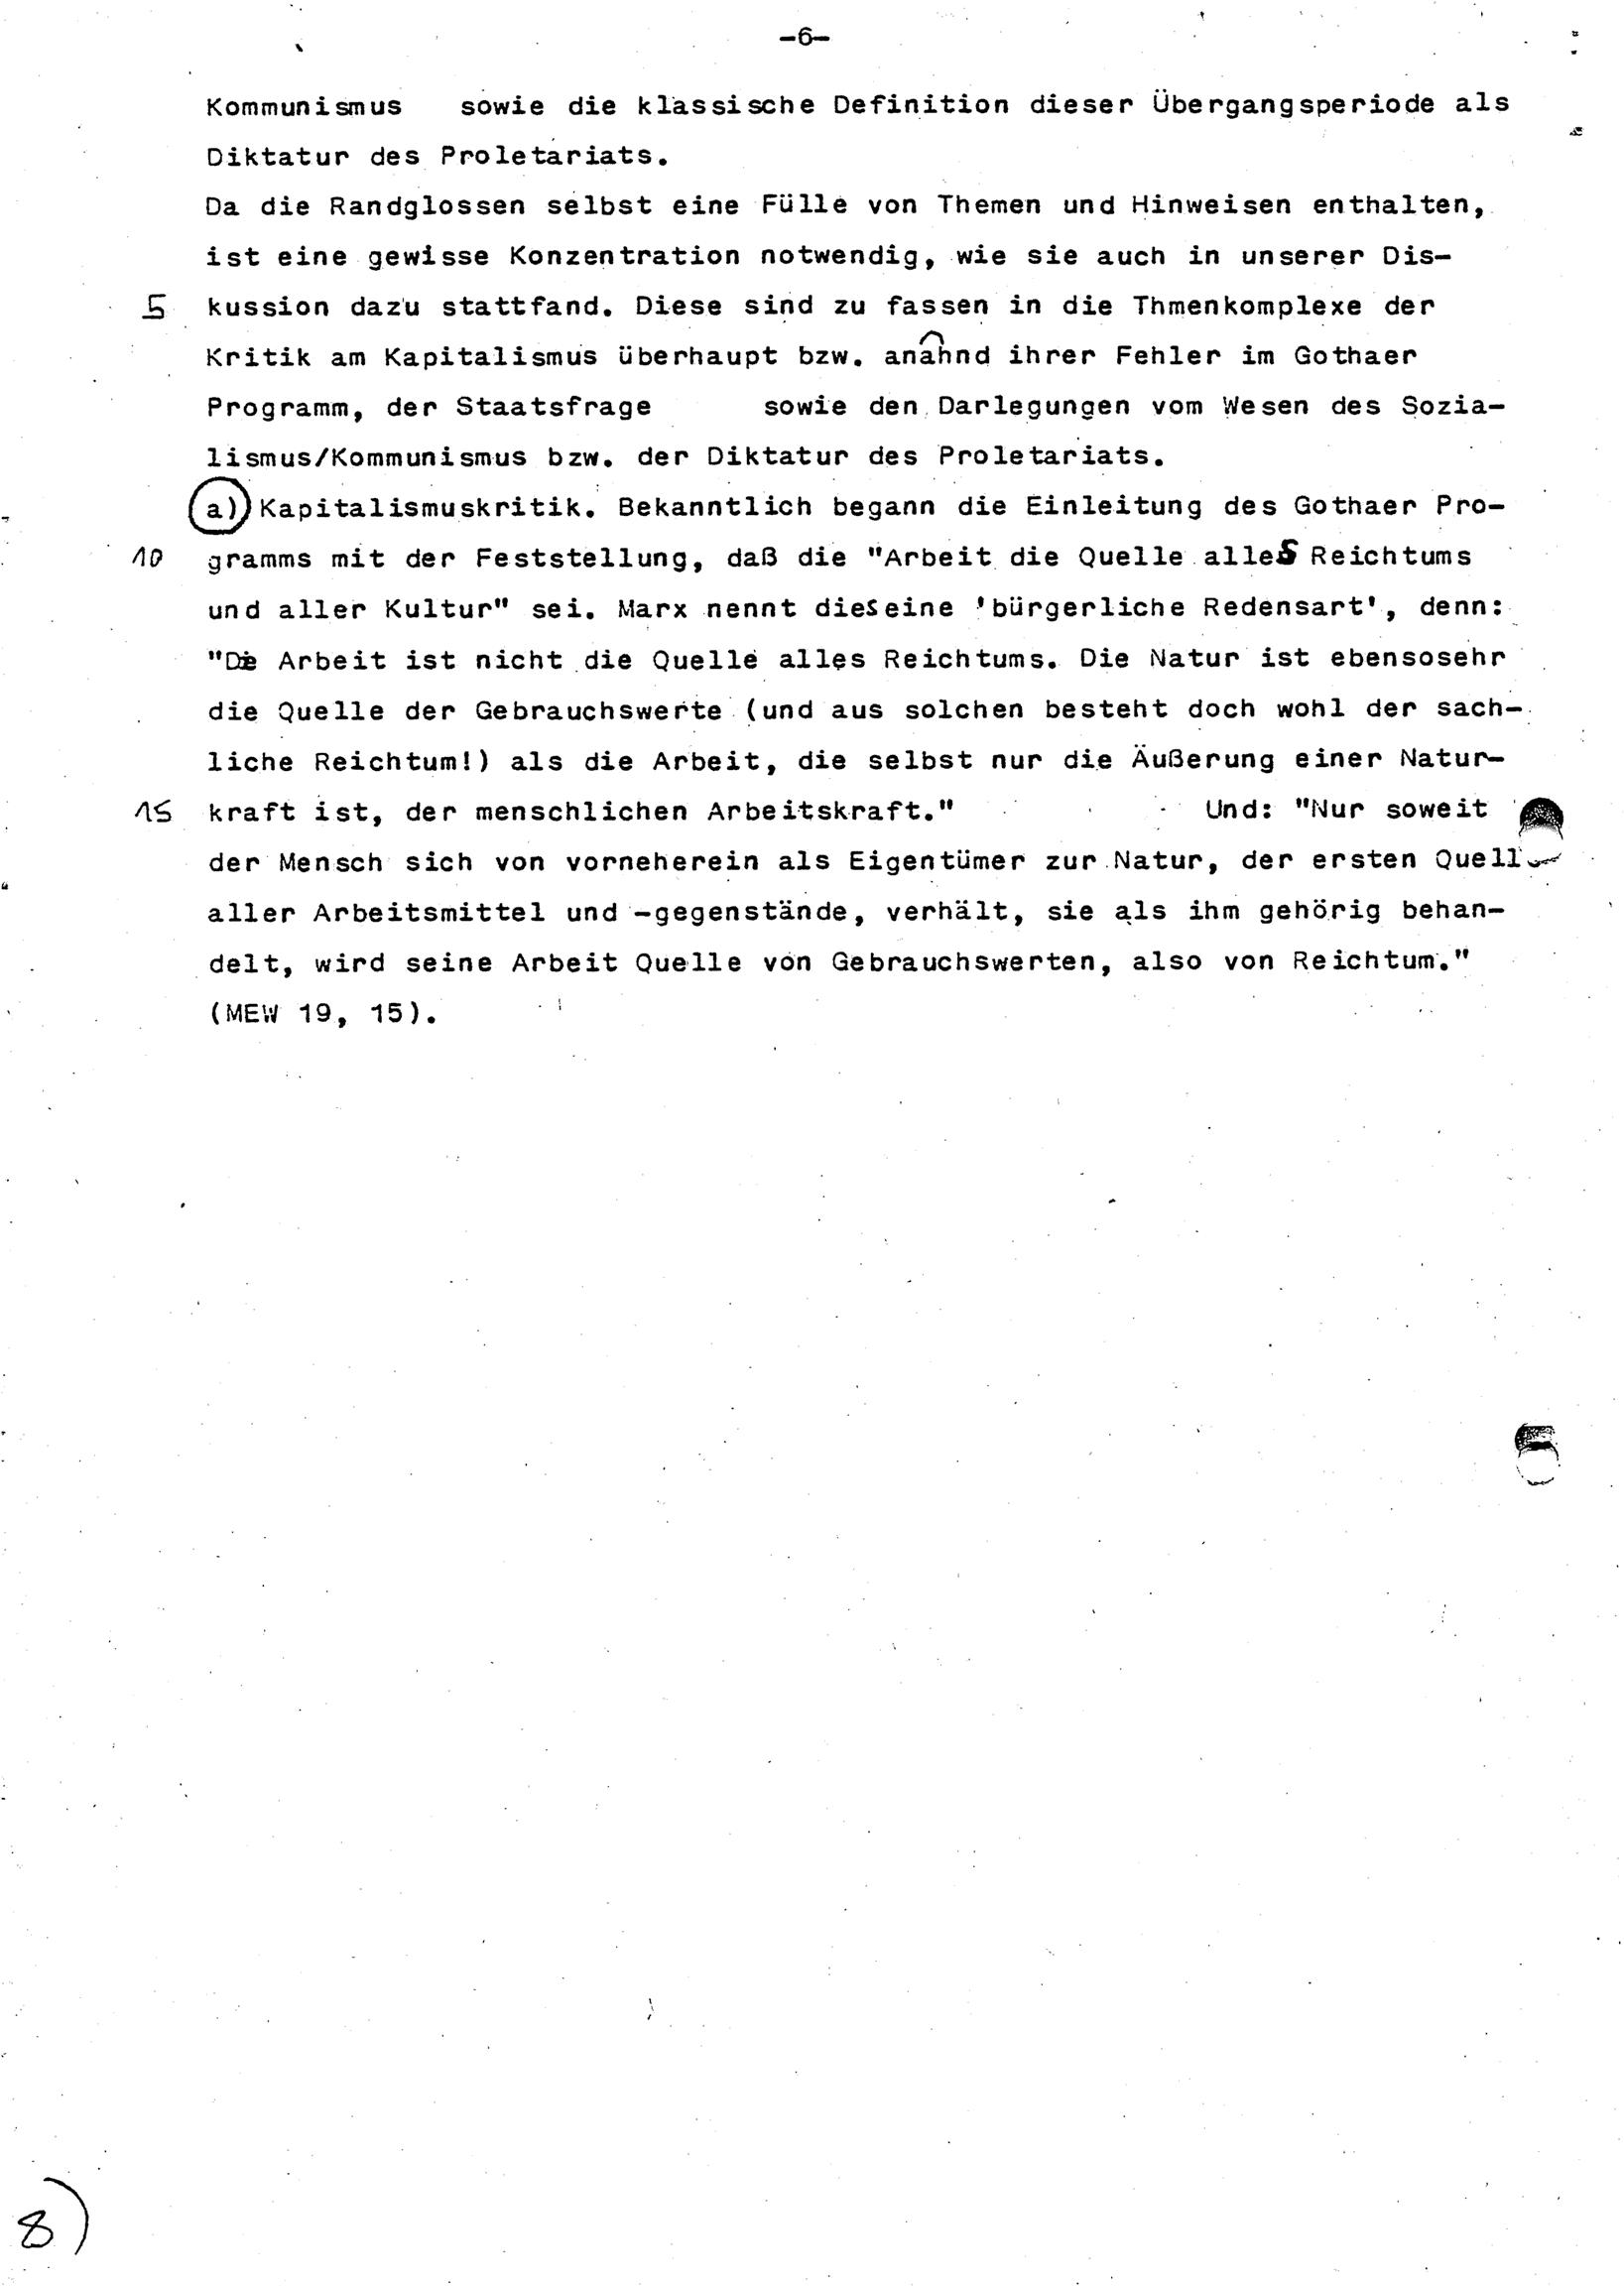 Ulm_KGU_Arbeitsheft_19830425_015_011